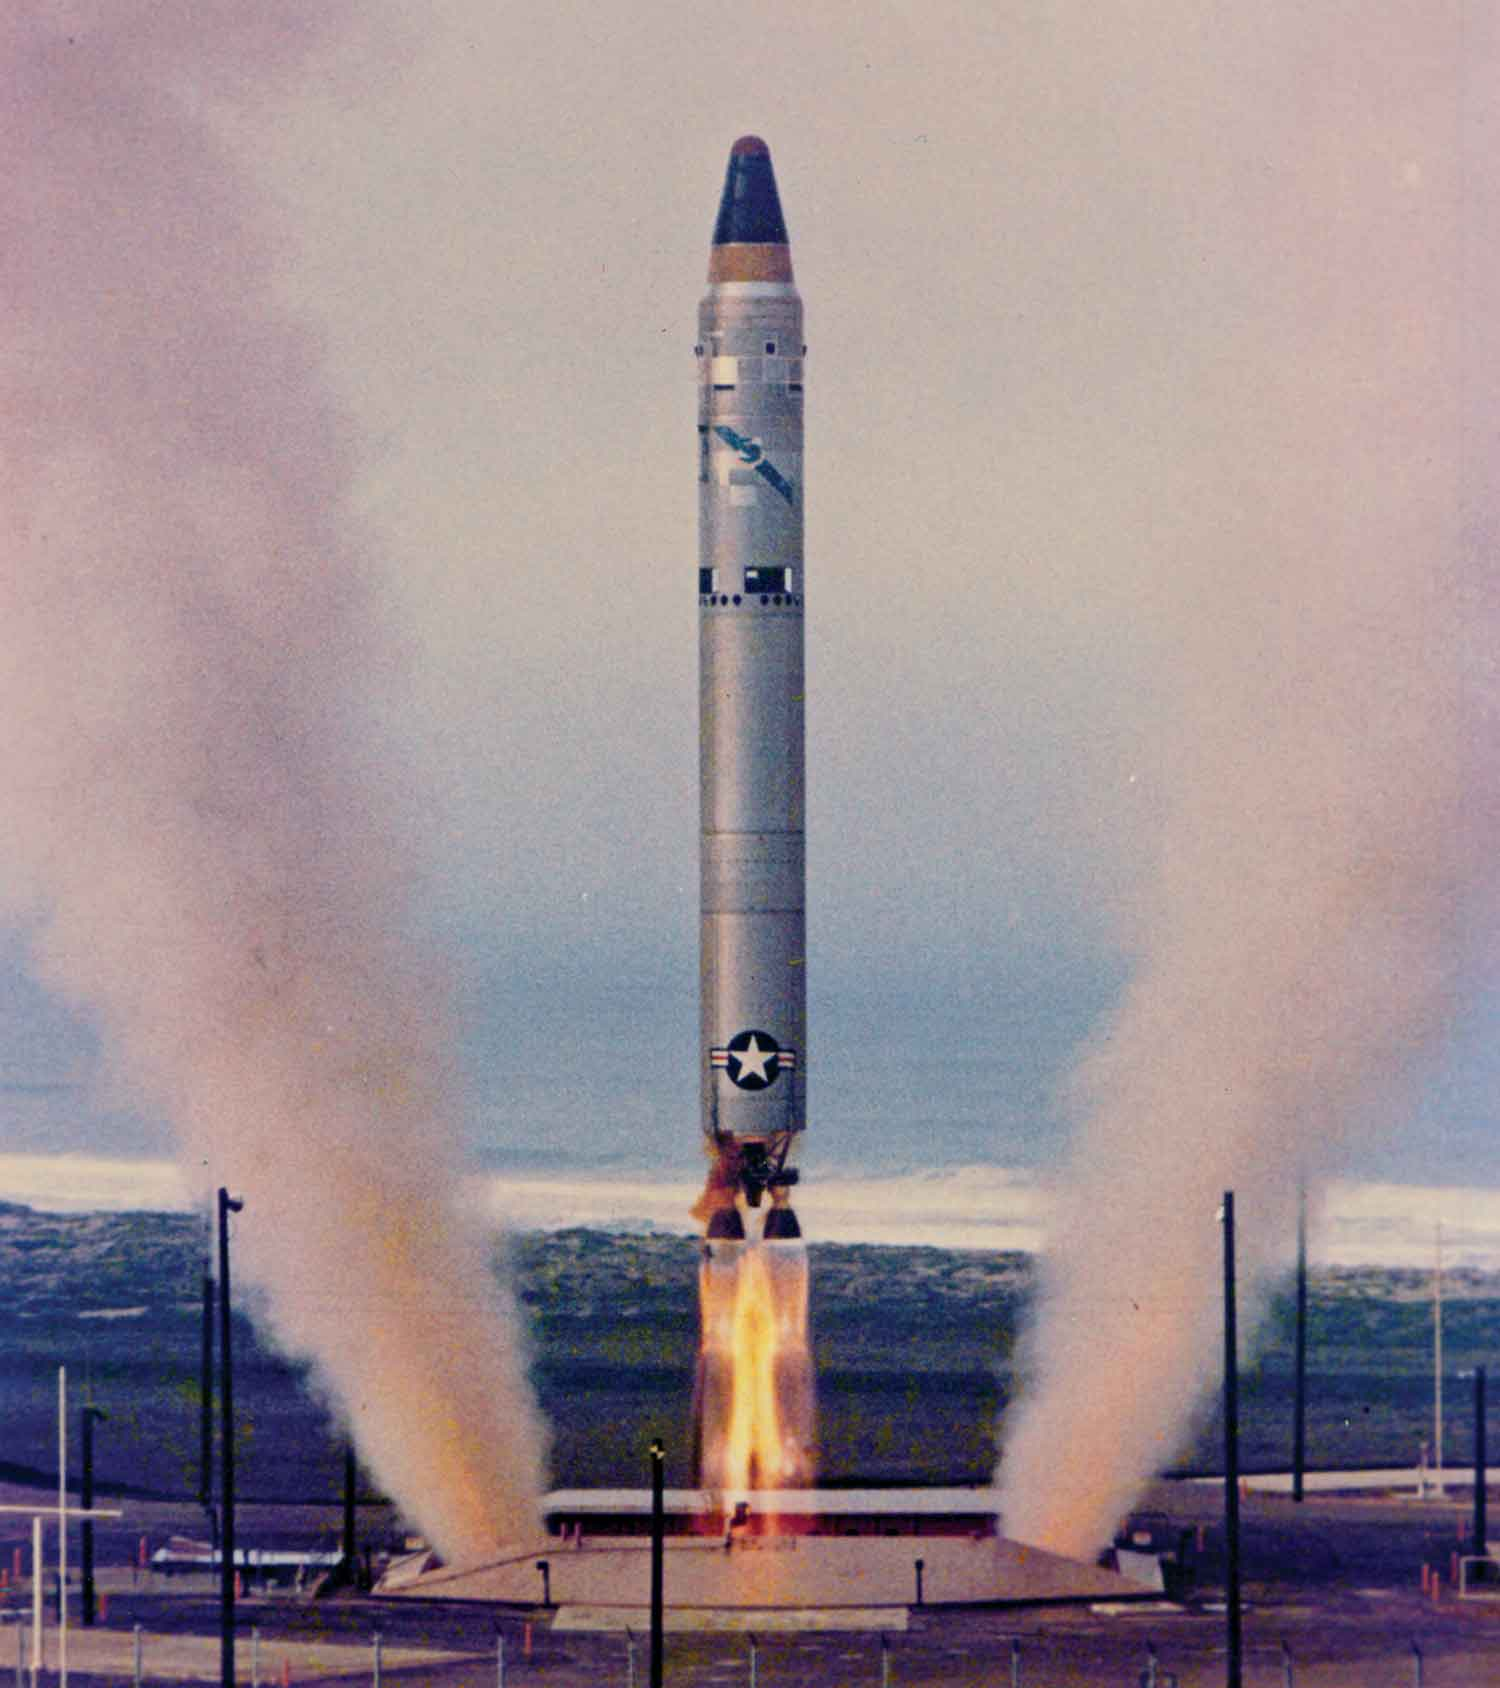 A test launch of a Titan II, 1960s